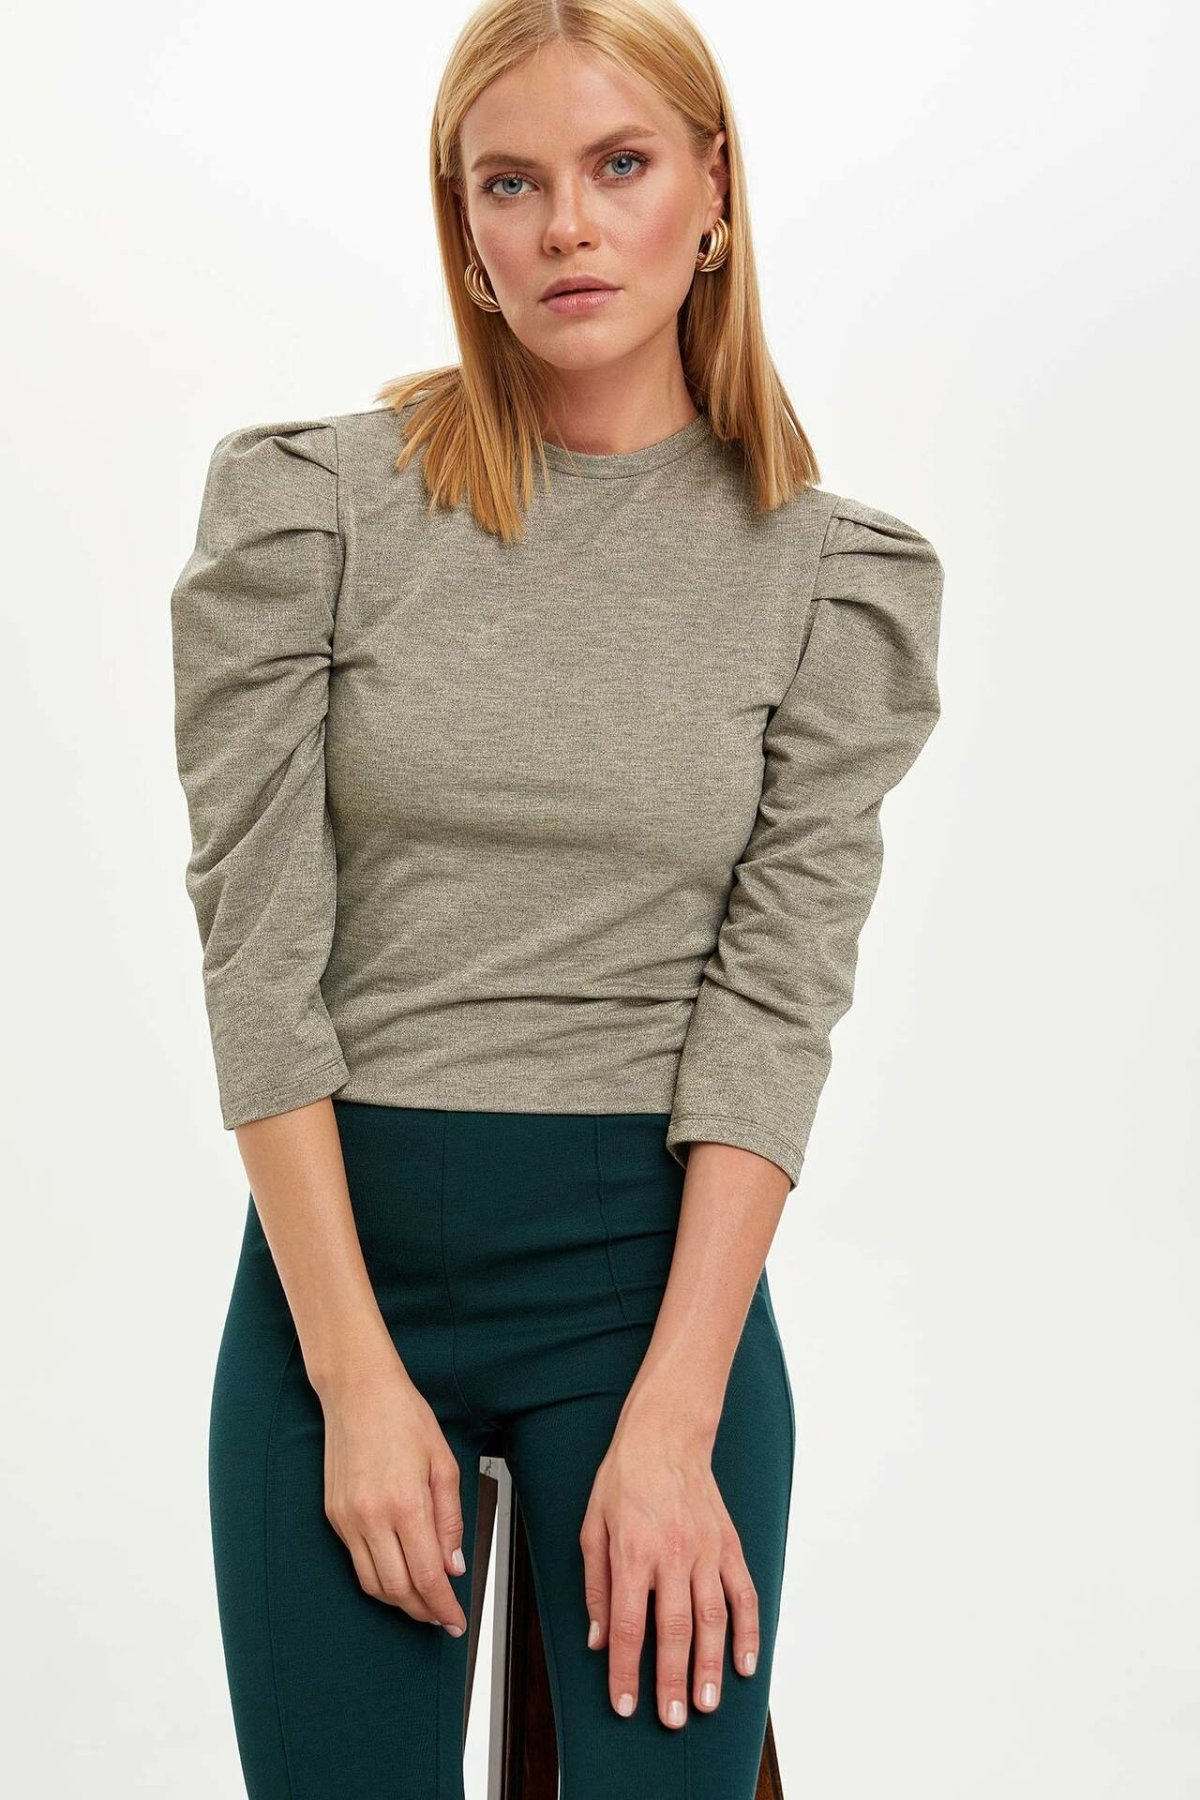 DeFacto Woman Sweat Shirt Women Fashion Puff Sleeve O-neck Cotton Hoodies Casual Stylish Tops-N1151AZ19WN